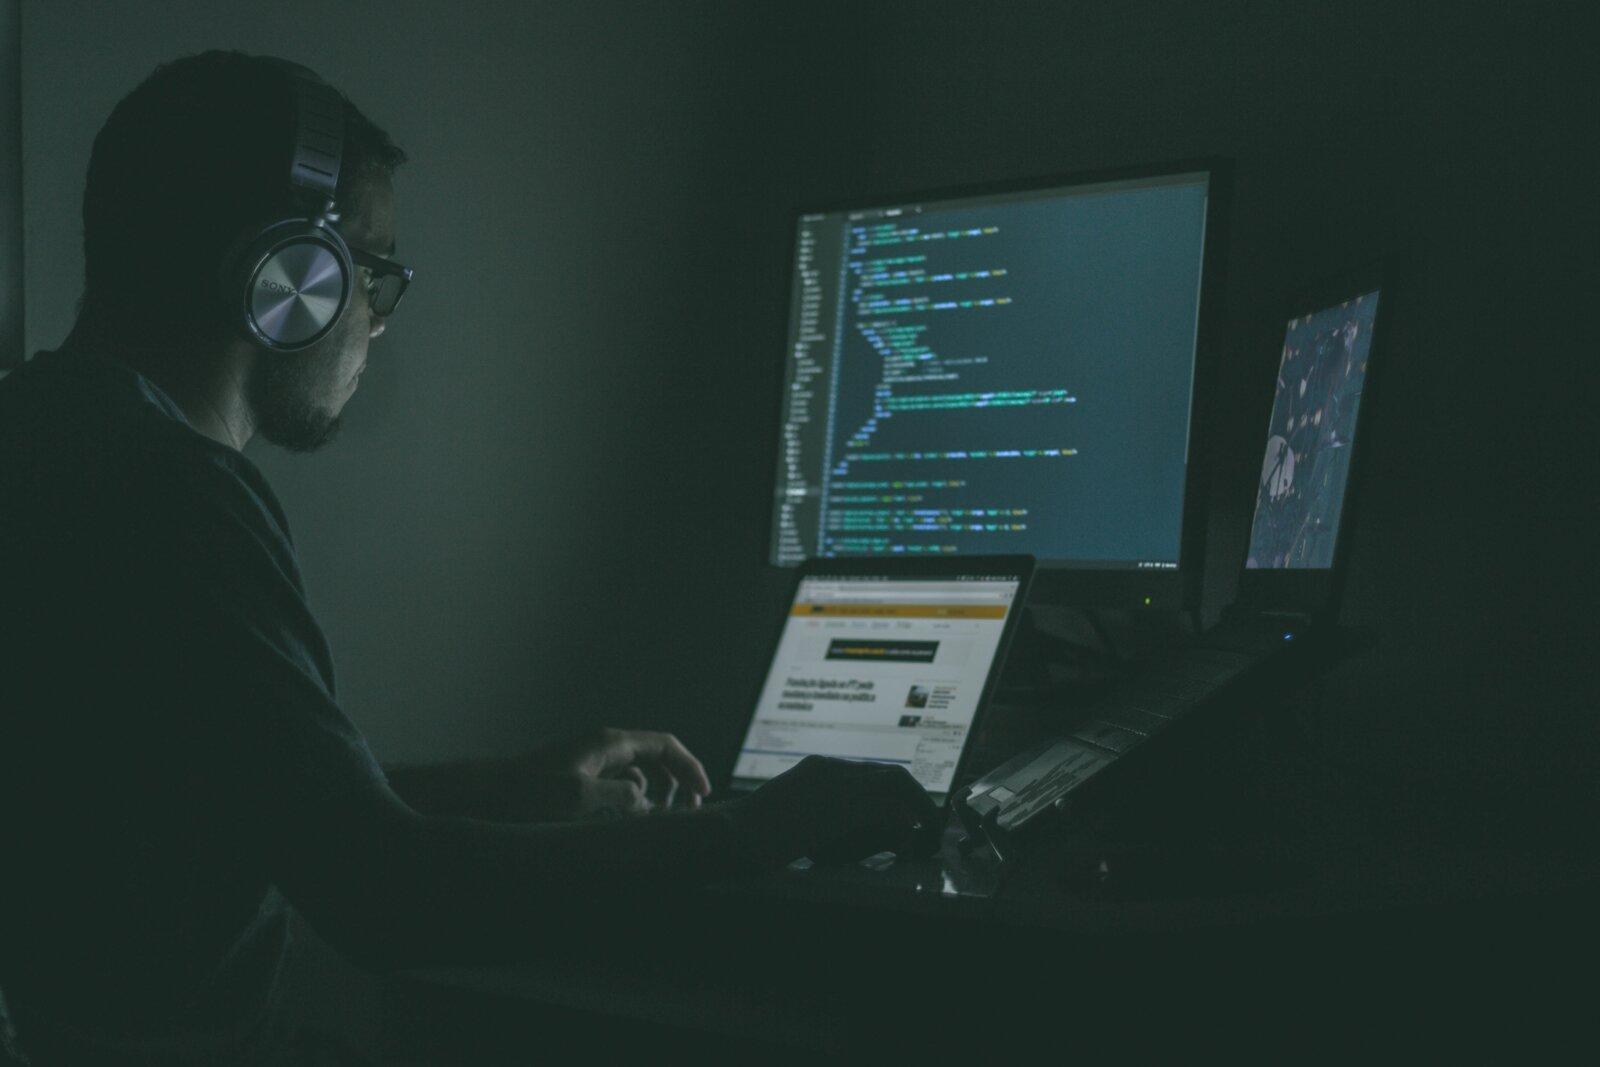 доход в Интернете без вложений